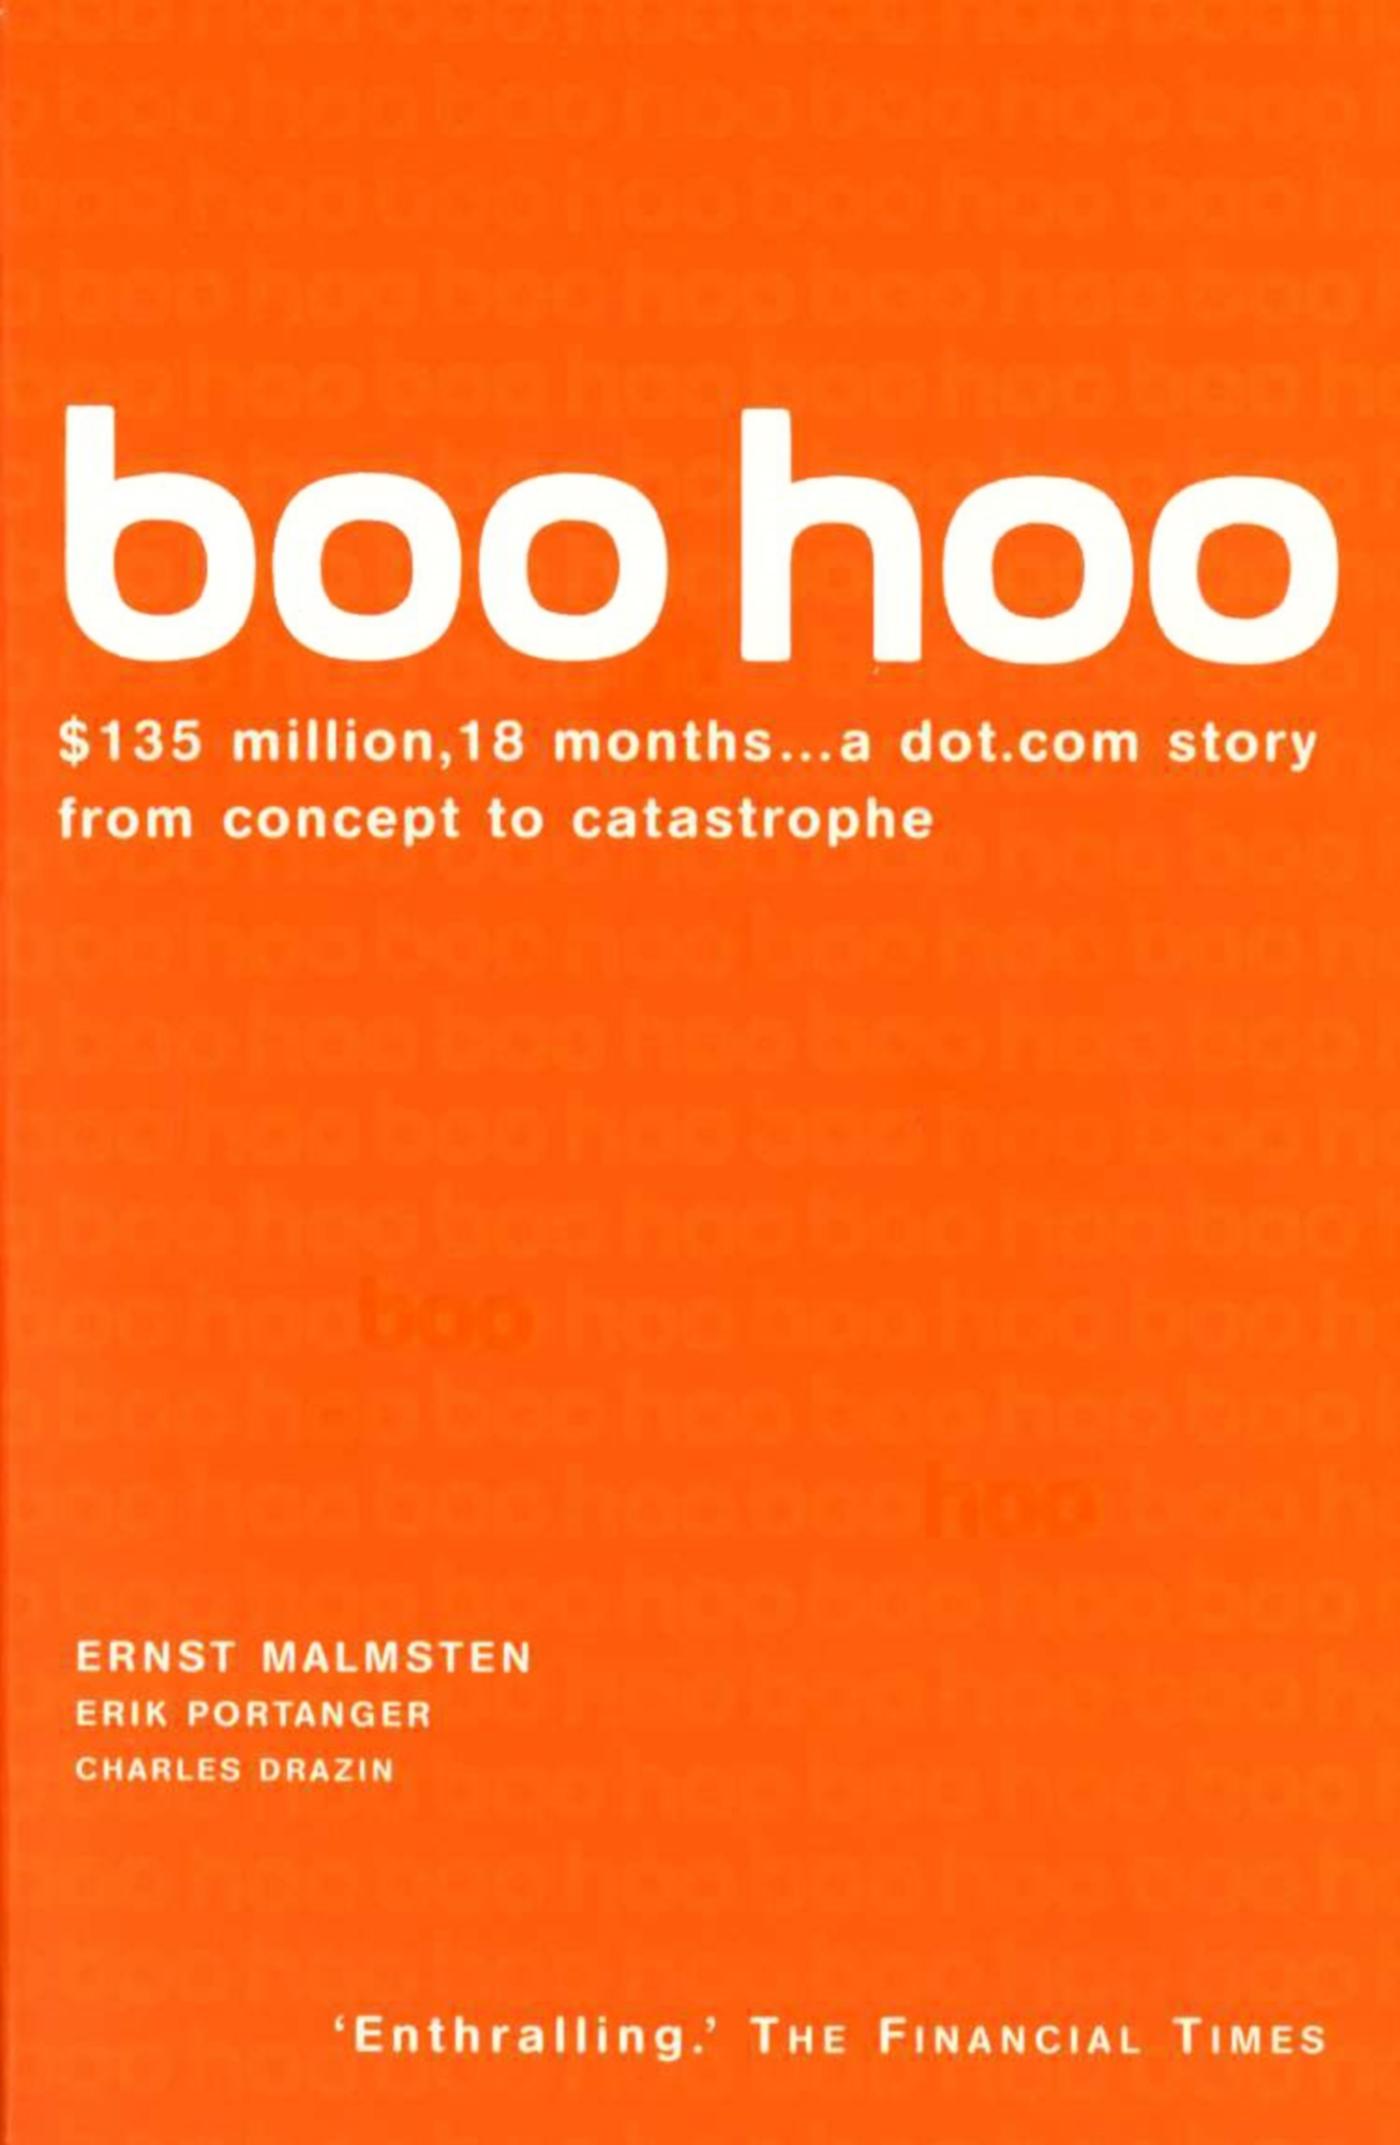 Boo Hoo by Charles Drazin - Penguin Books Australia